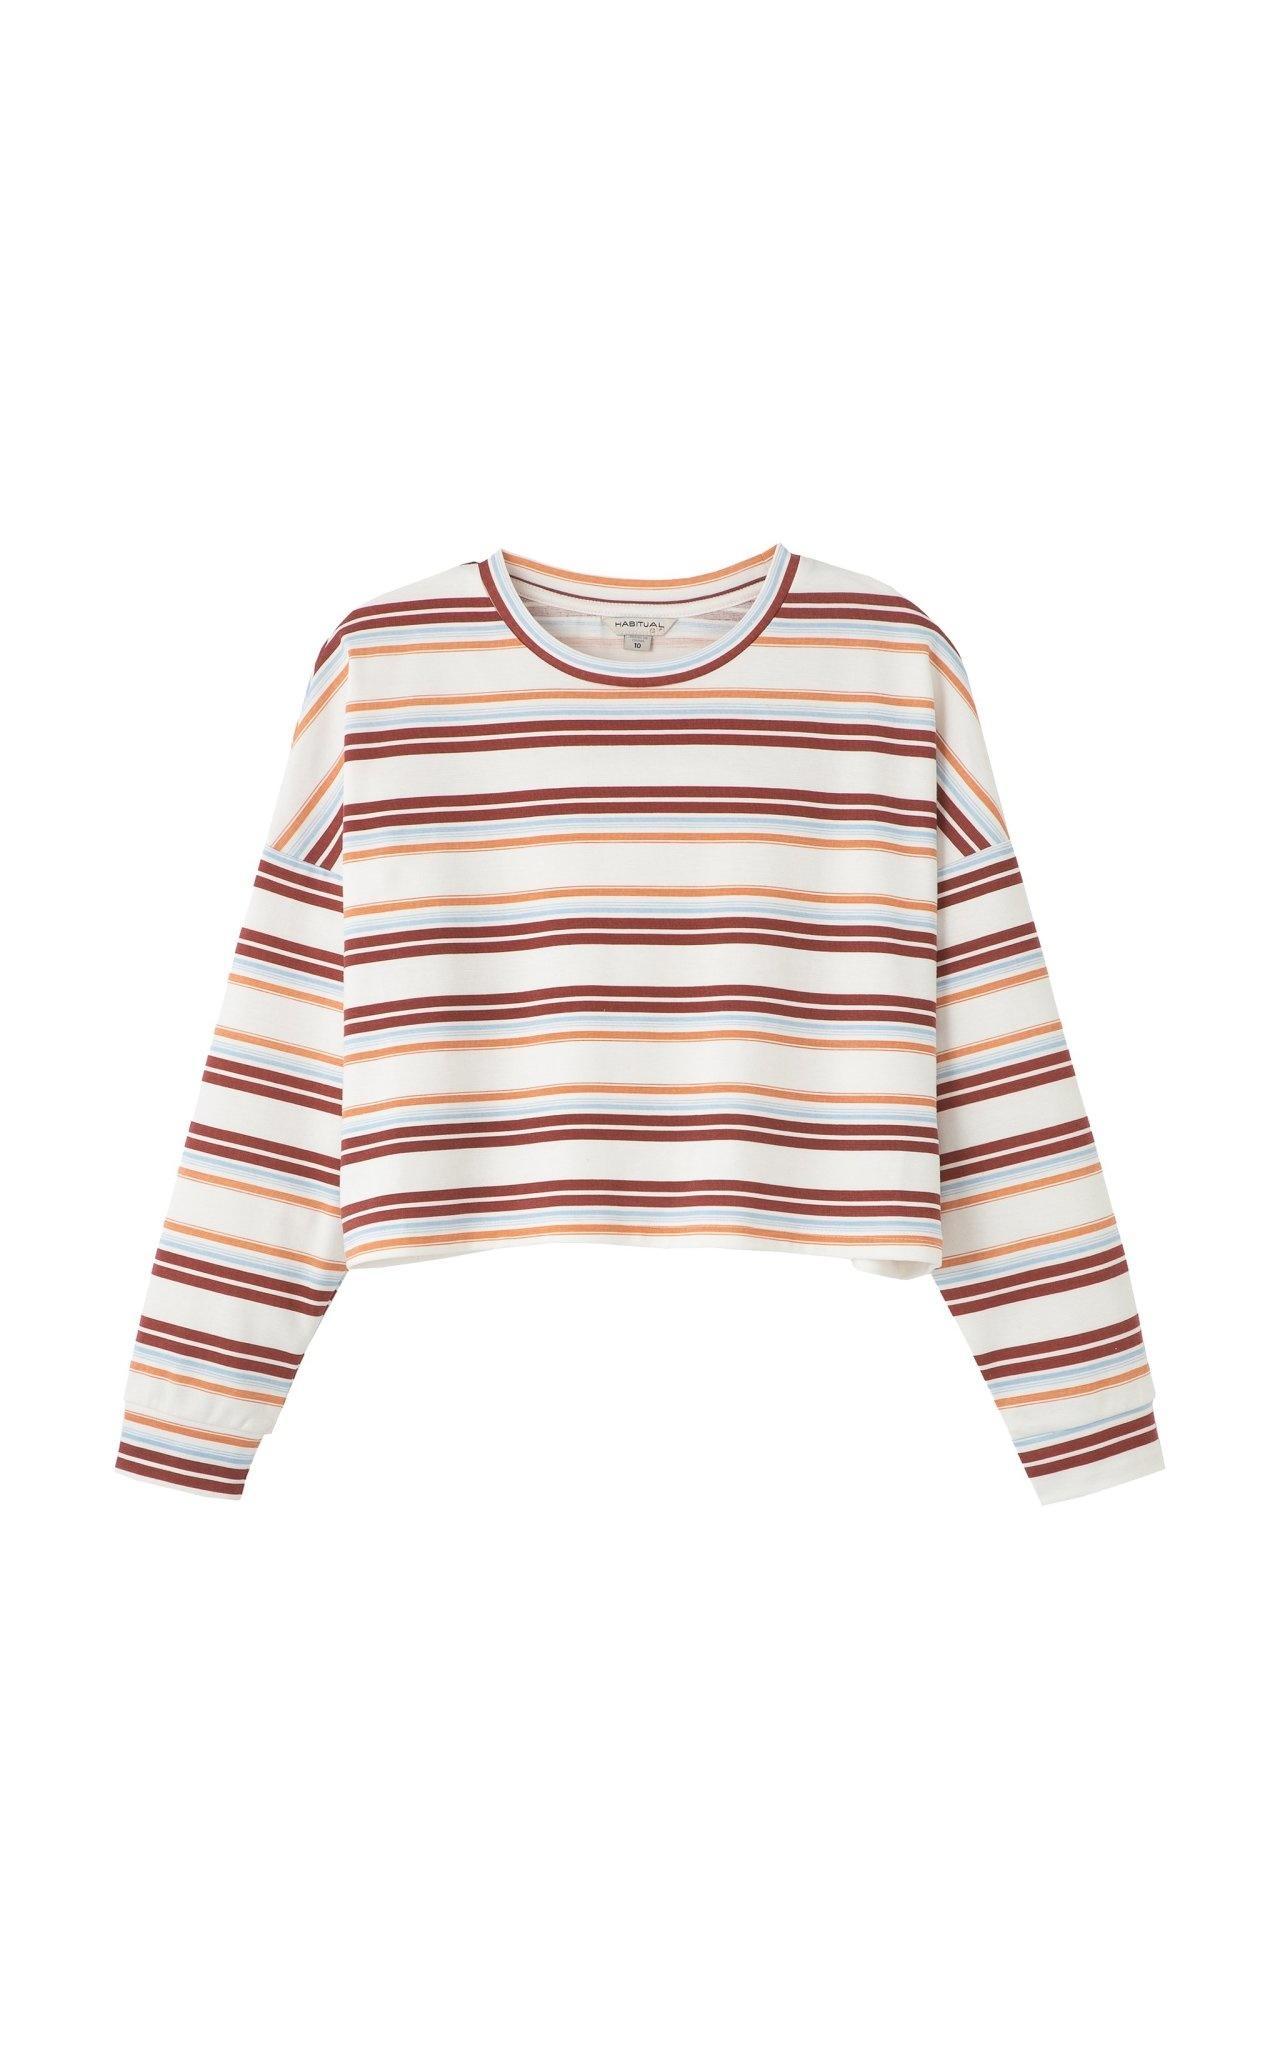 Habitual Sloane Striped Cropped Top